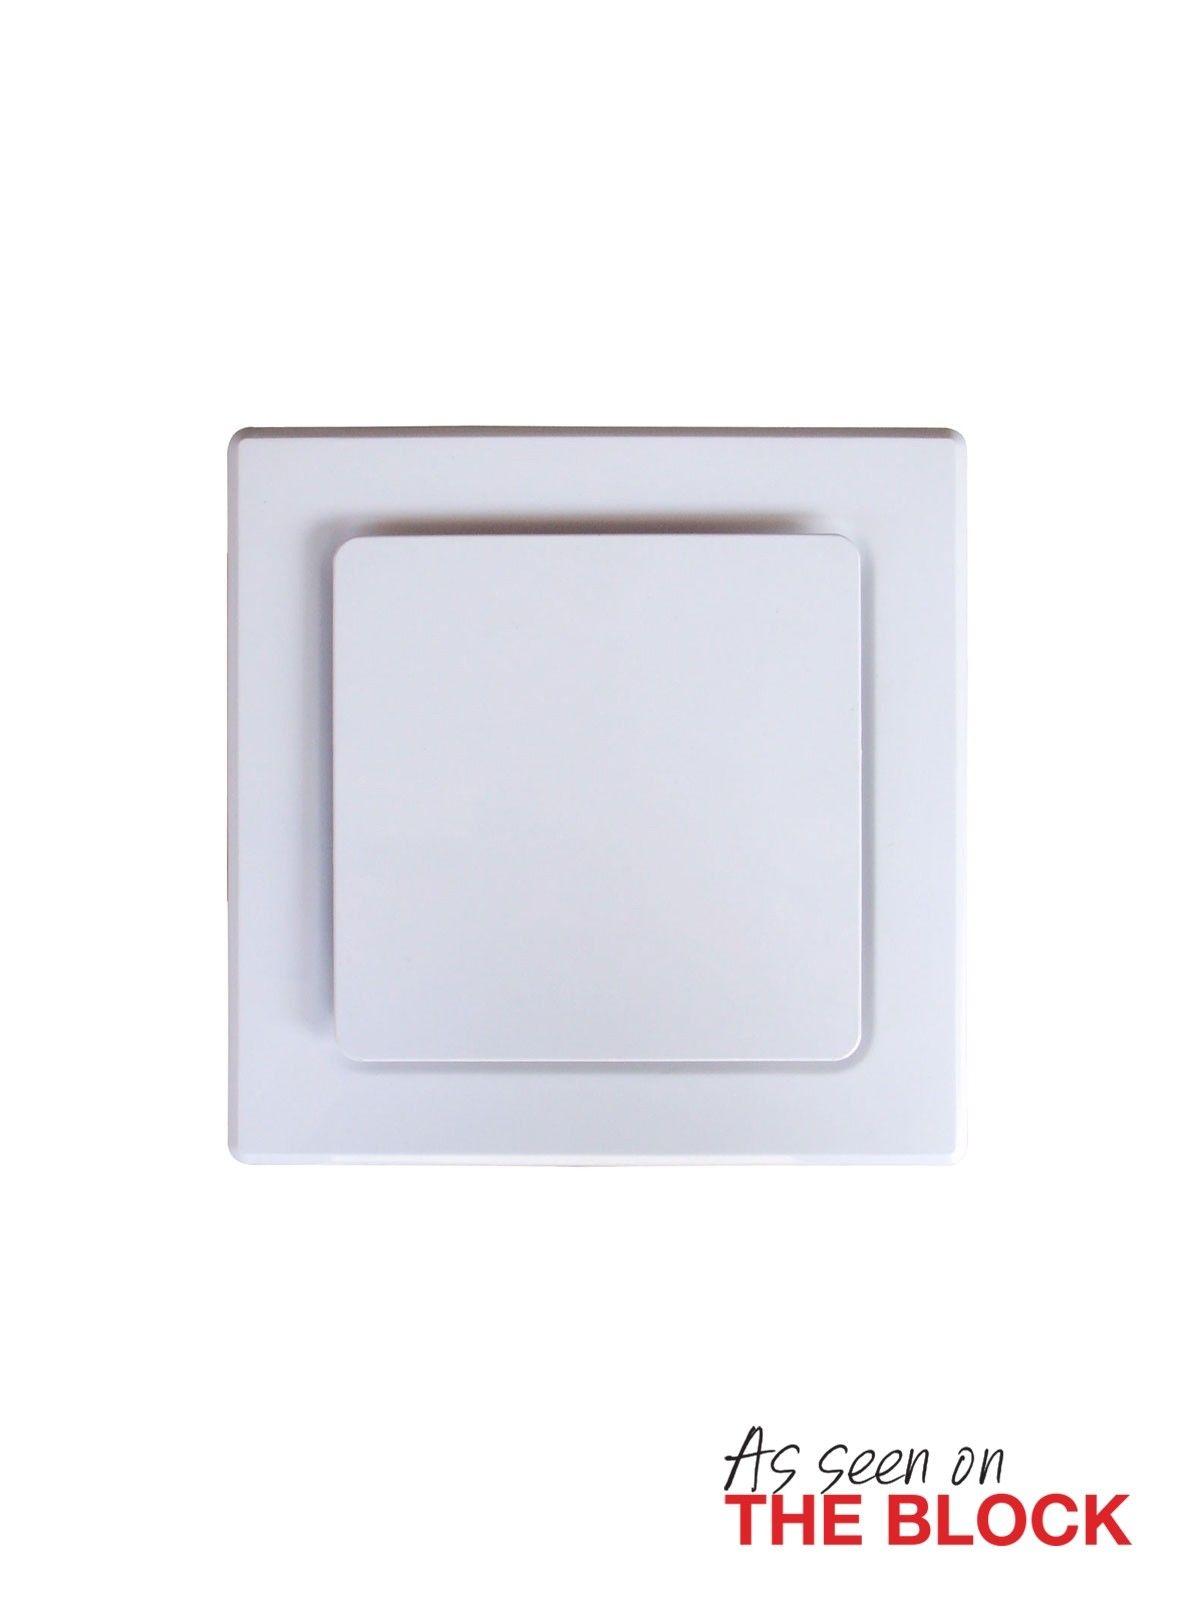 Lucci 250mm Designer Square Exhaust Fan in White | Bathroom ...